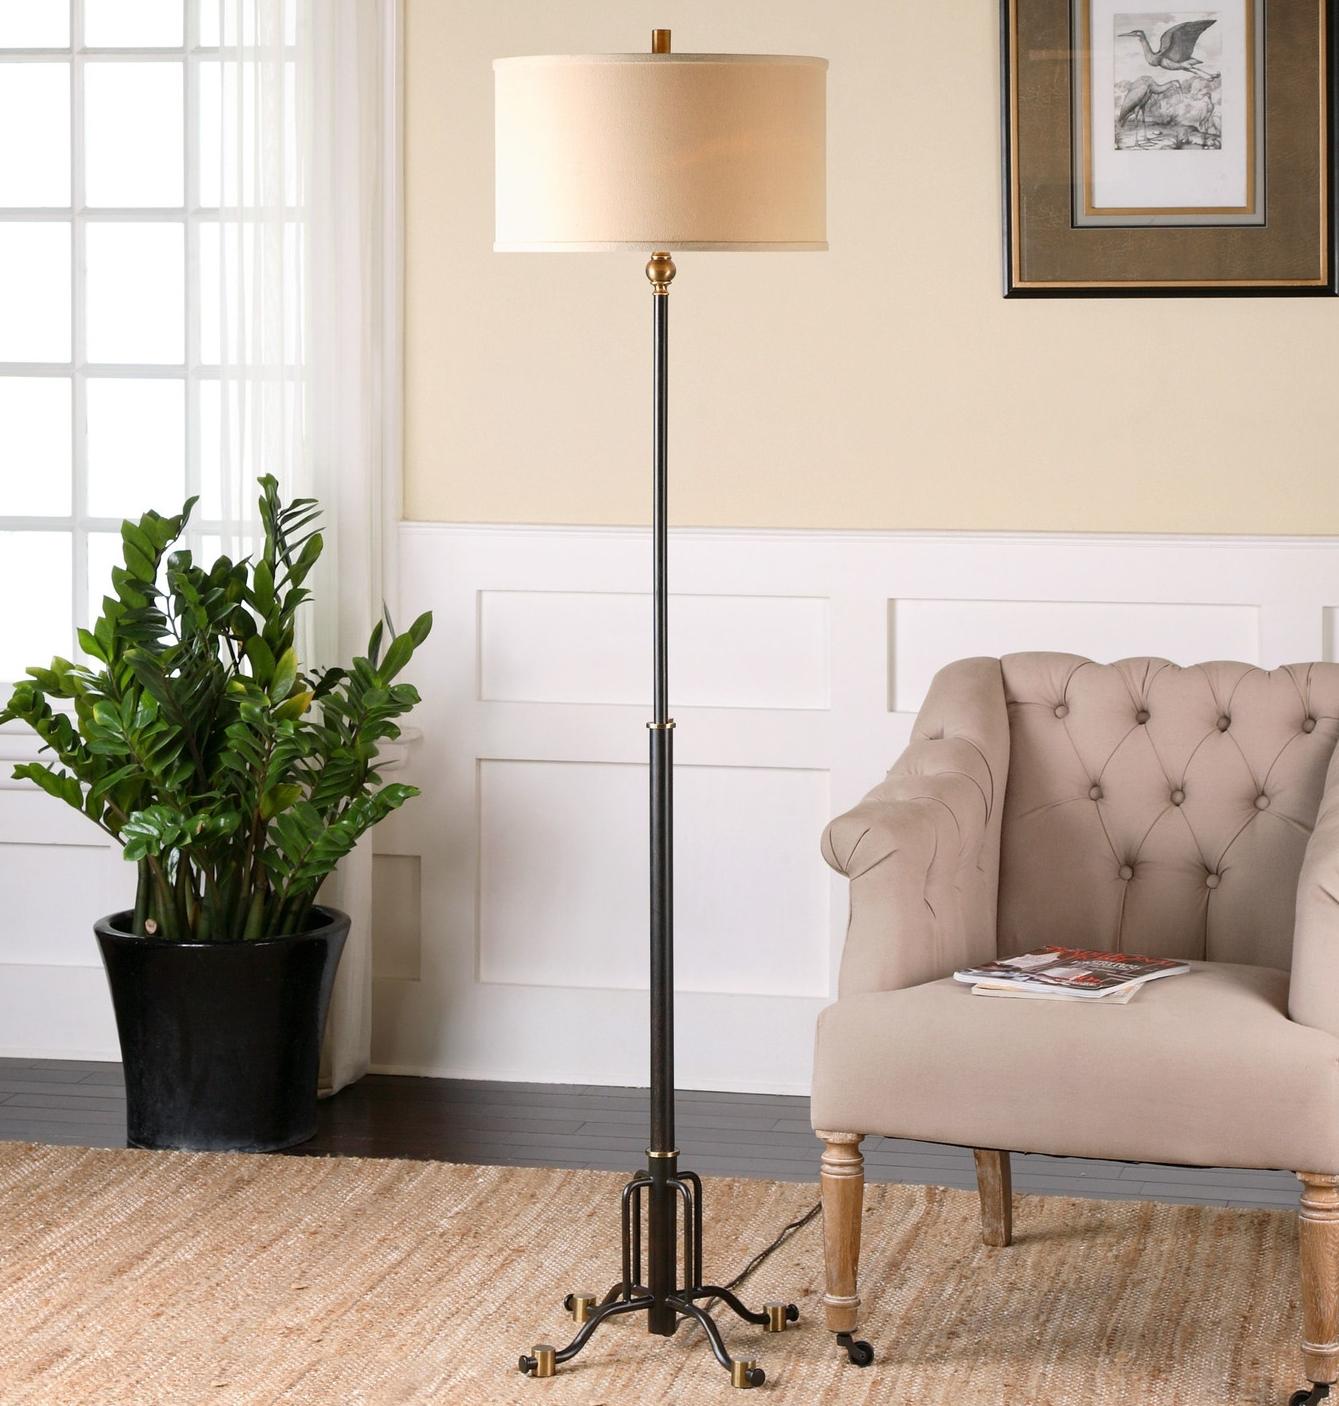 Halvern-69.25-Floor-Lamp-28636-1.jpg